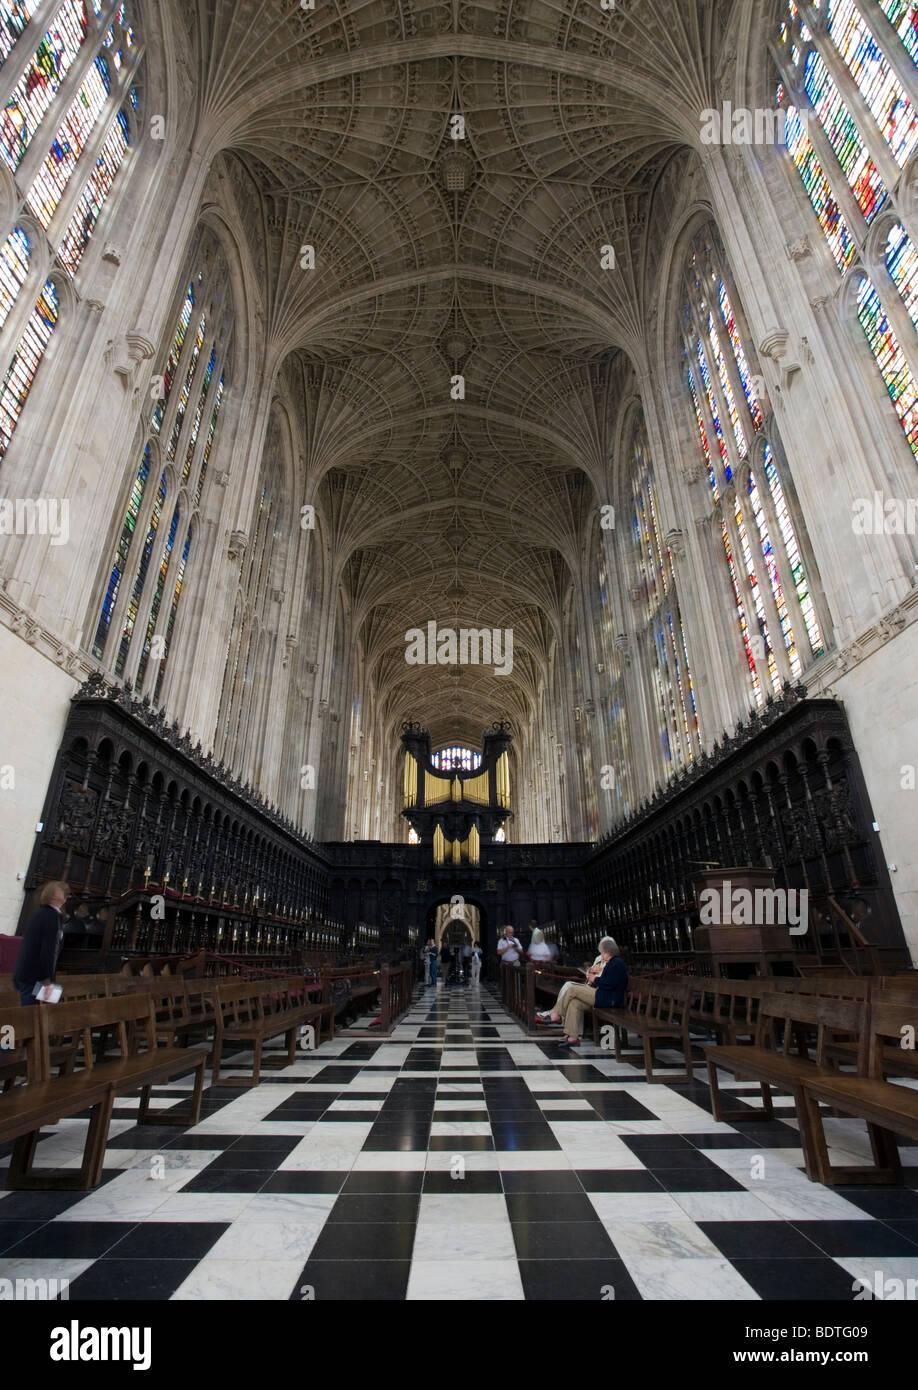 Inside King's College Chapel in Cambridge, UK. - Stock Image